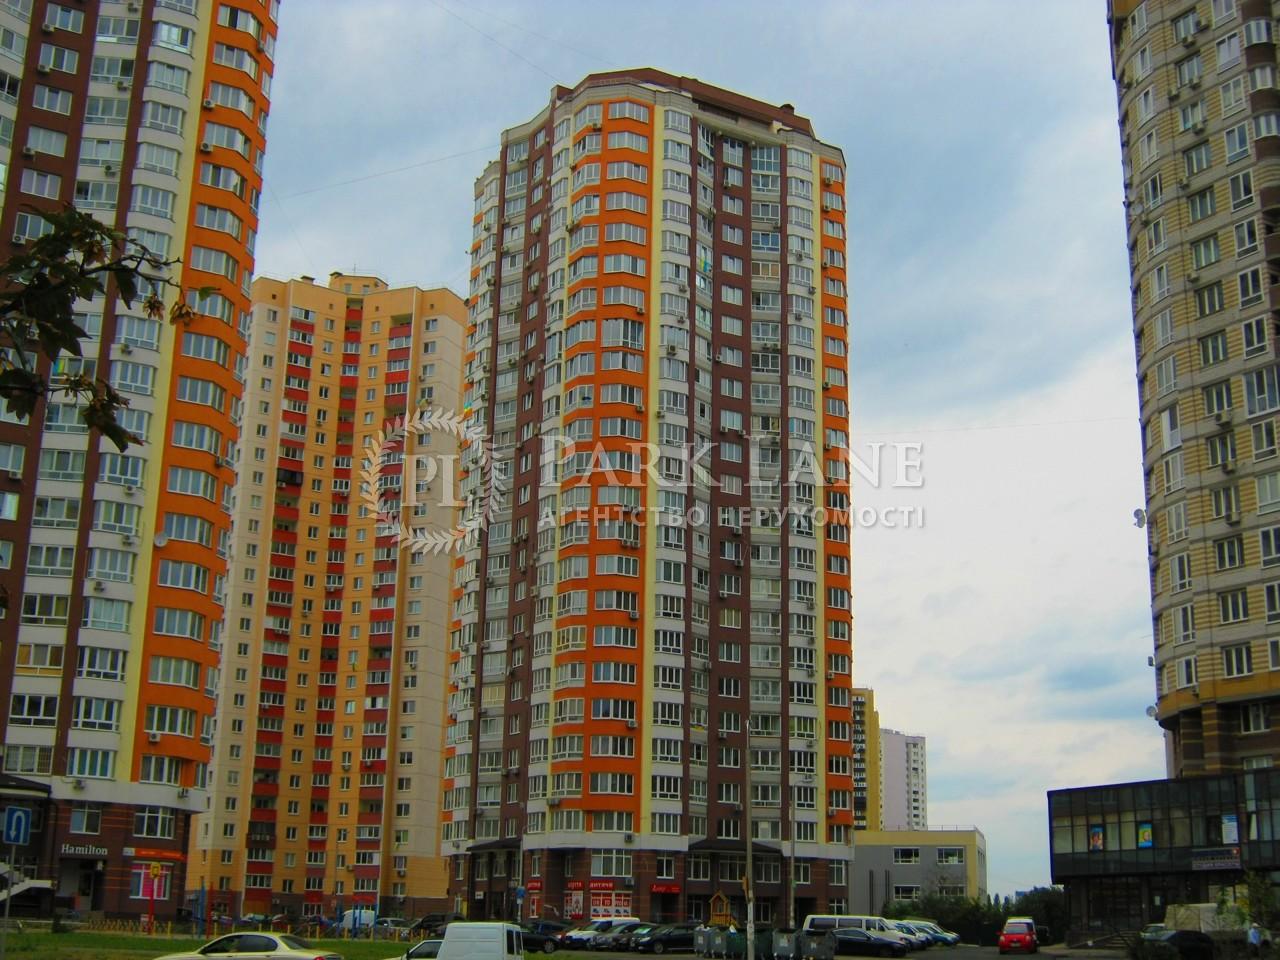 Квартира ул. Ахматовой, 34, Киев, R-12598 - Фото 1